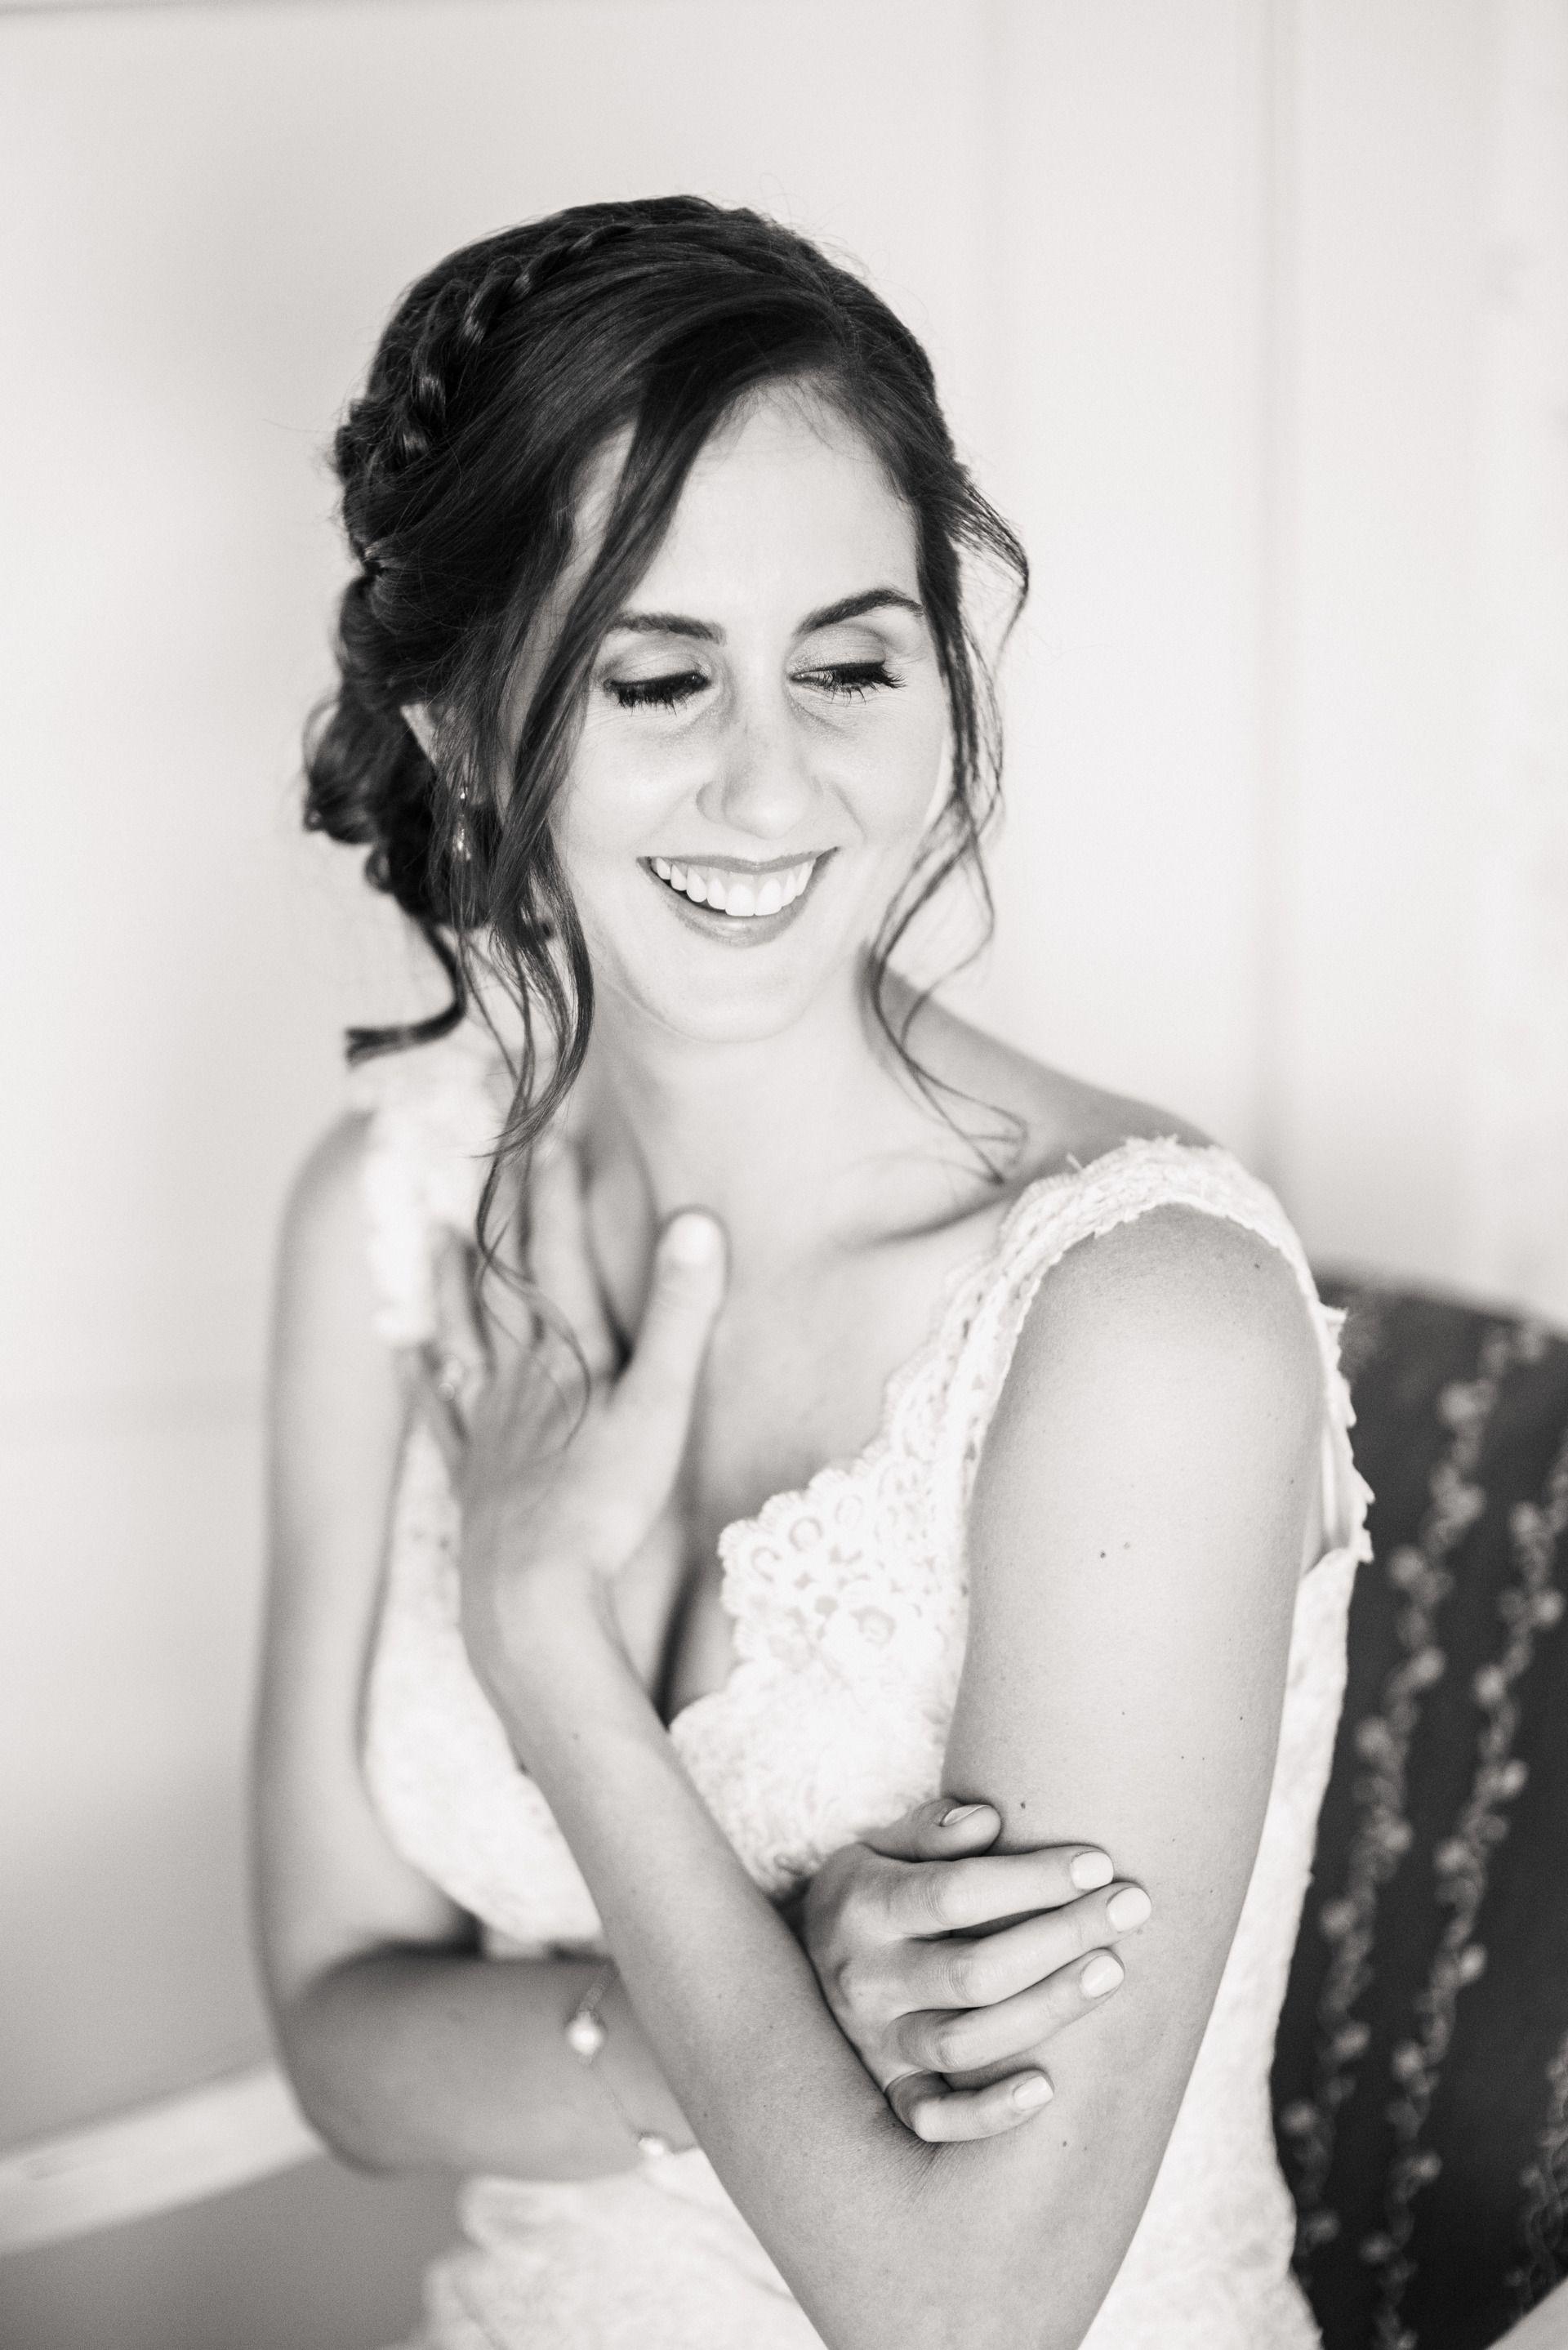 Braided bridal up-do, loose curly locks, chic wedding day hair ideas ...